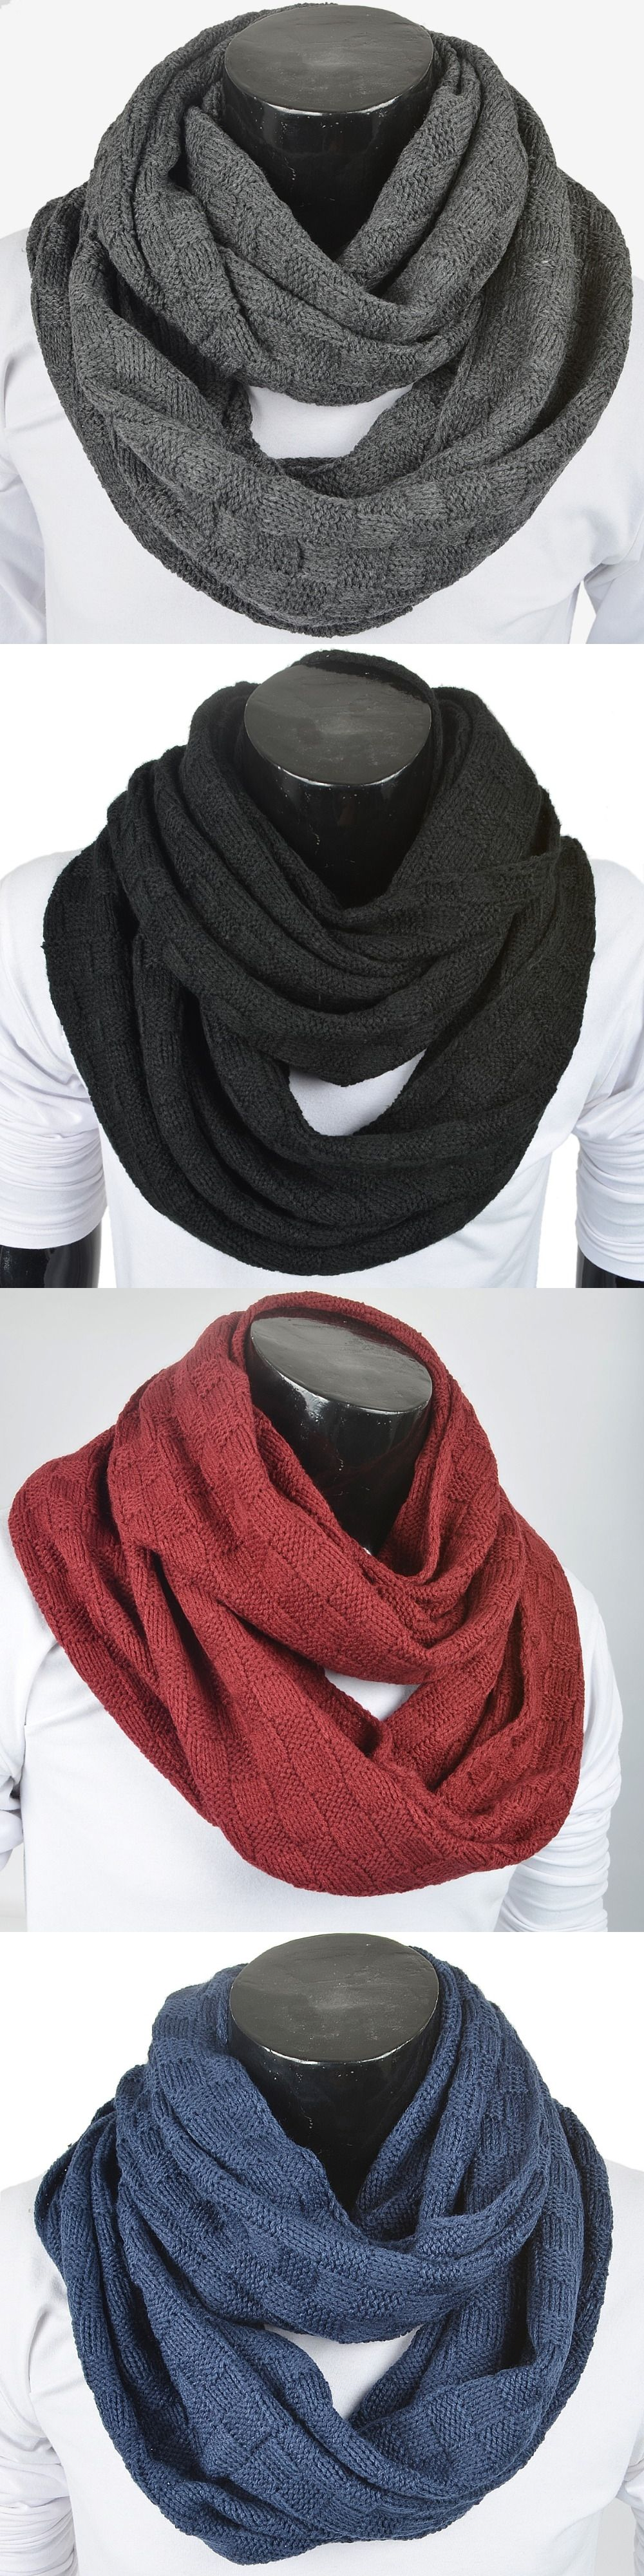 on mens intexx scarf amazon kvr infinity